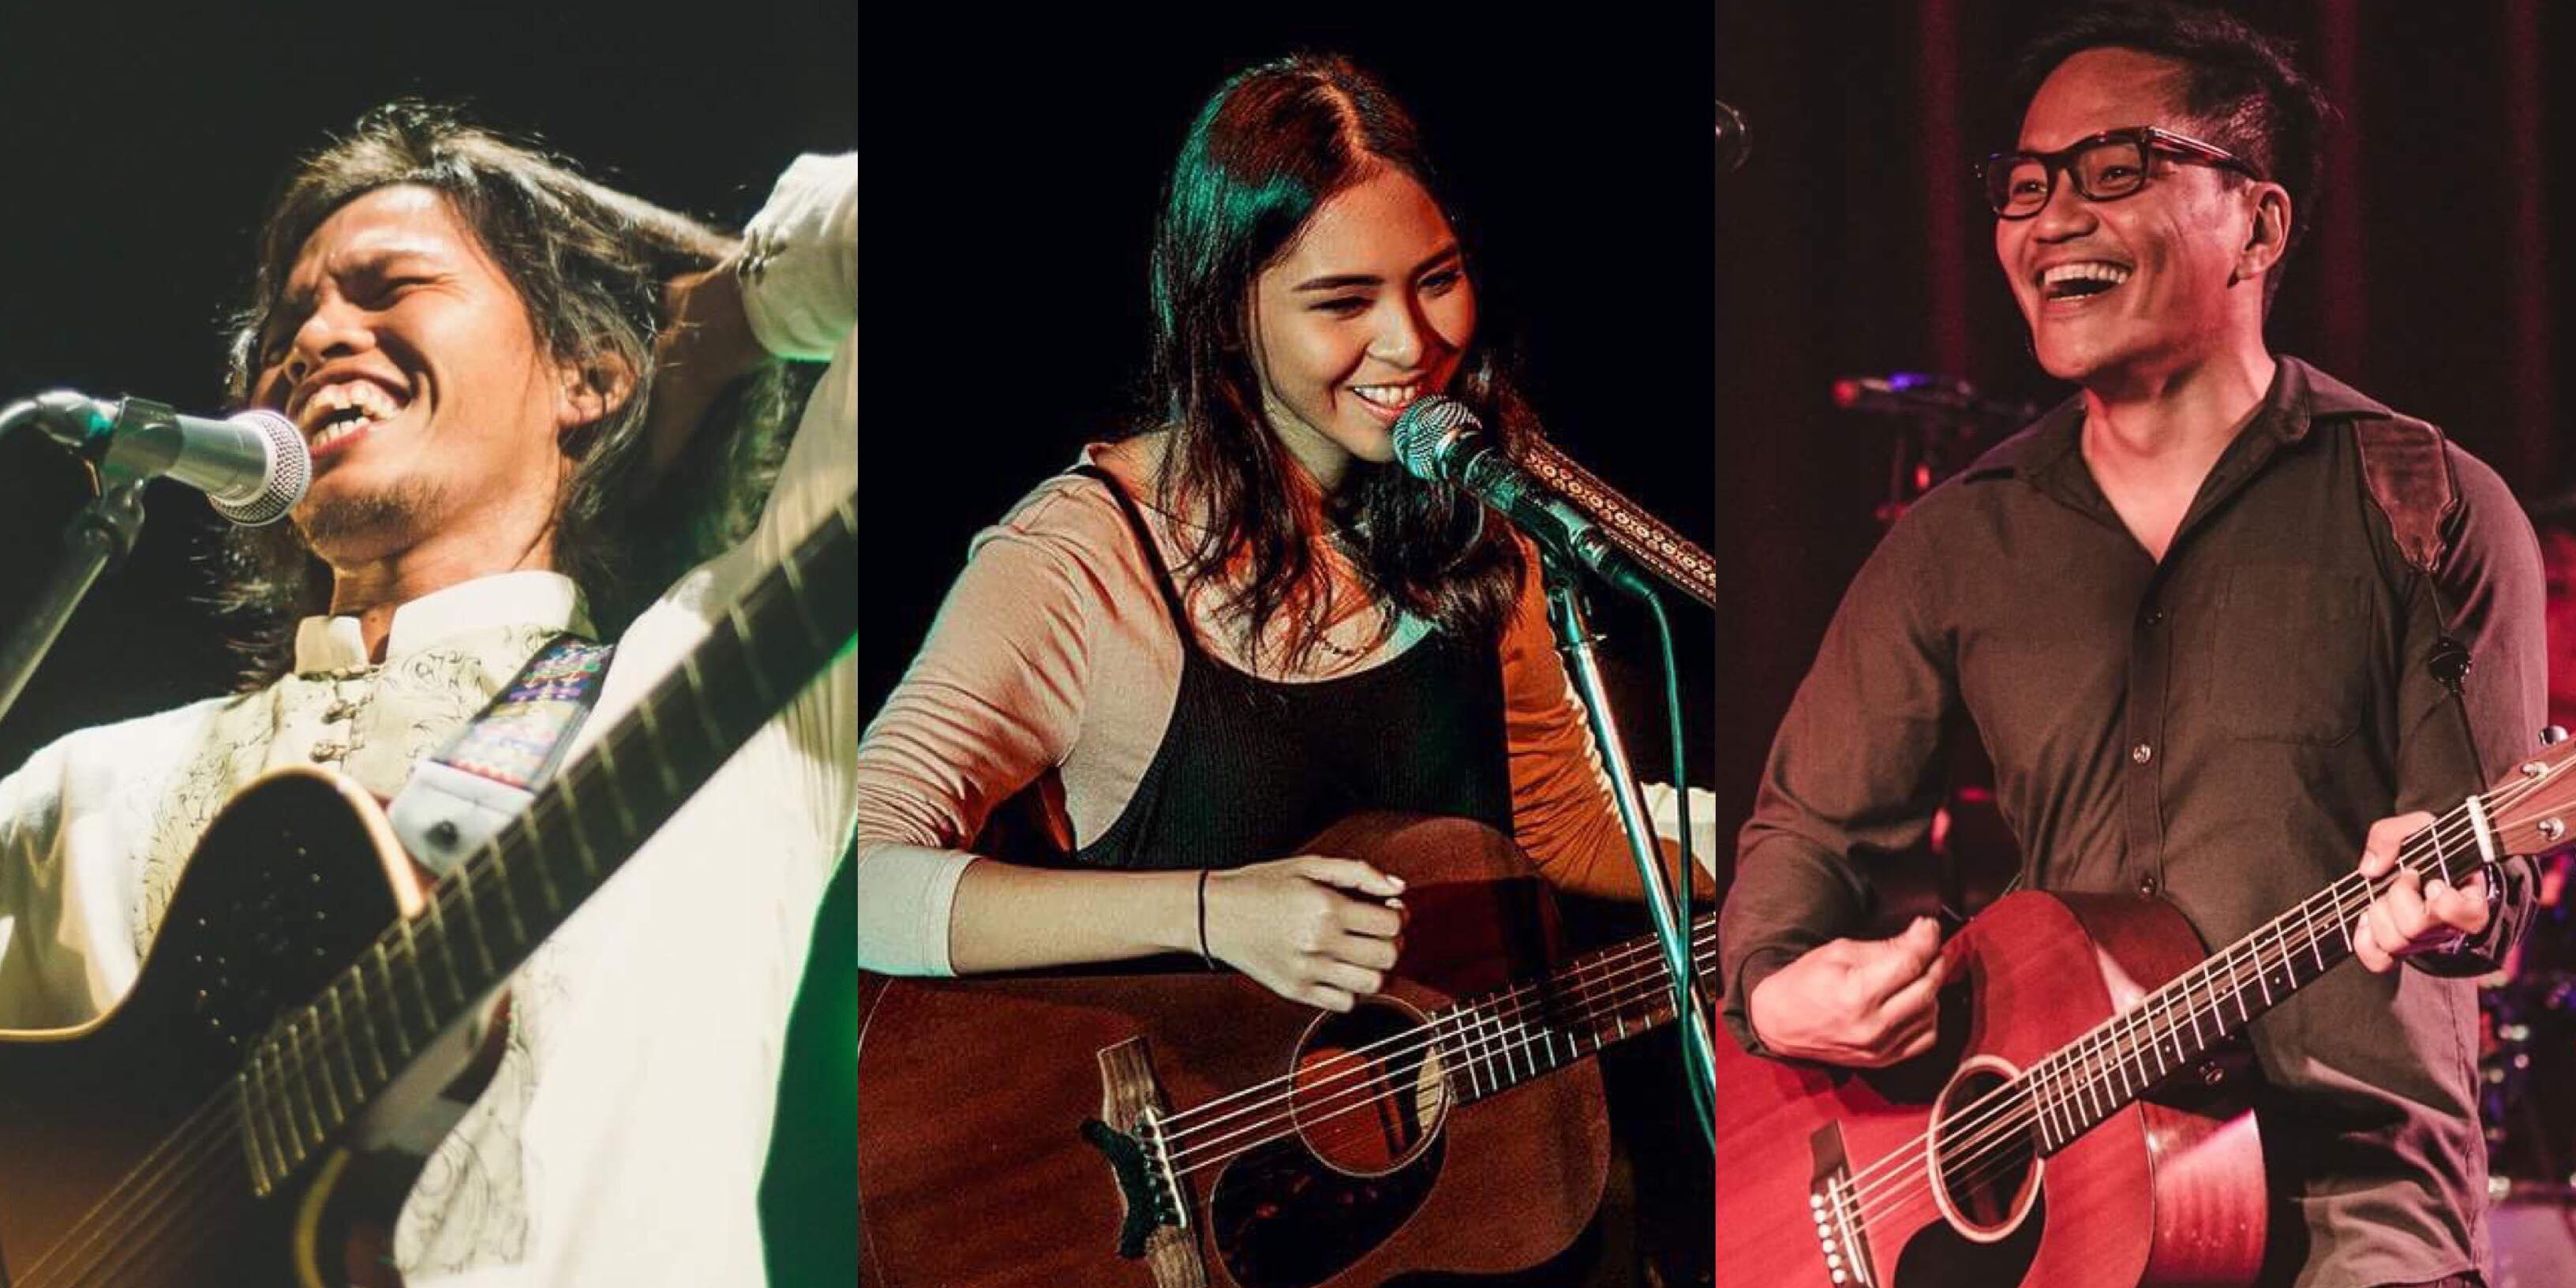 Ensemble: A Valentine Concert unveils line-up - Bullet Dumas, Clara Benin, Ebe Dancel, and more